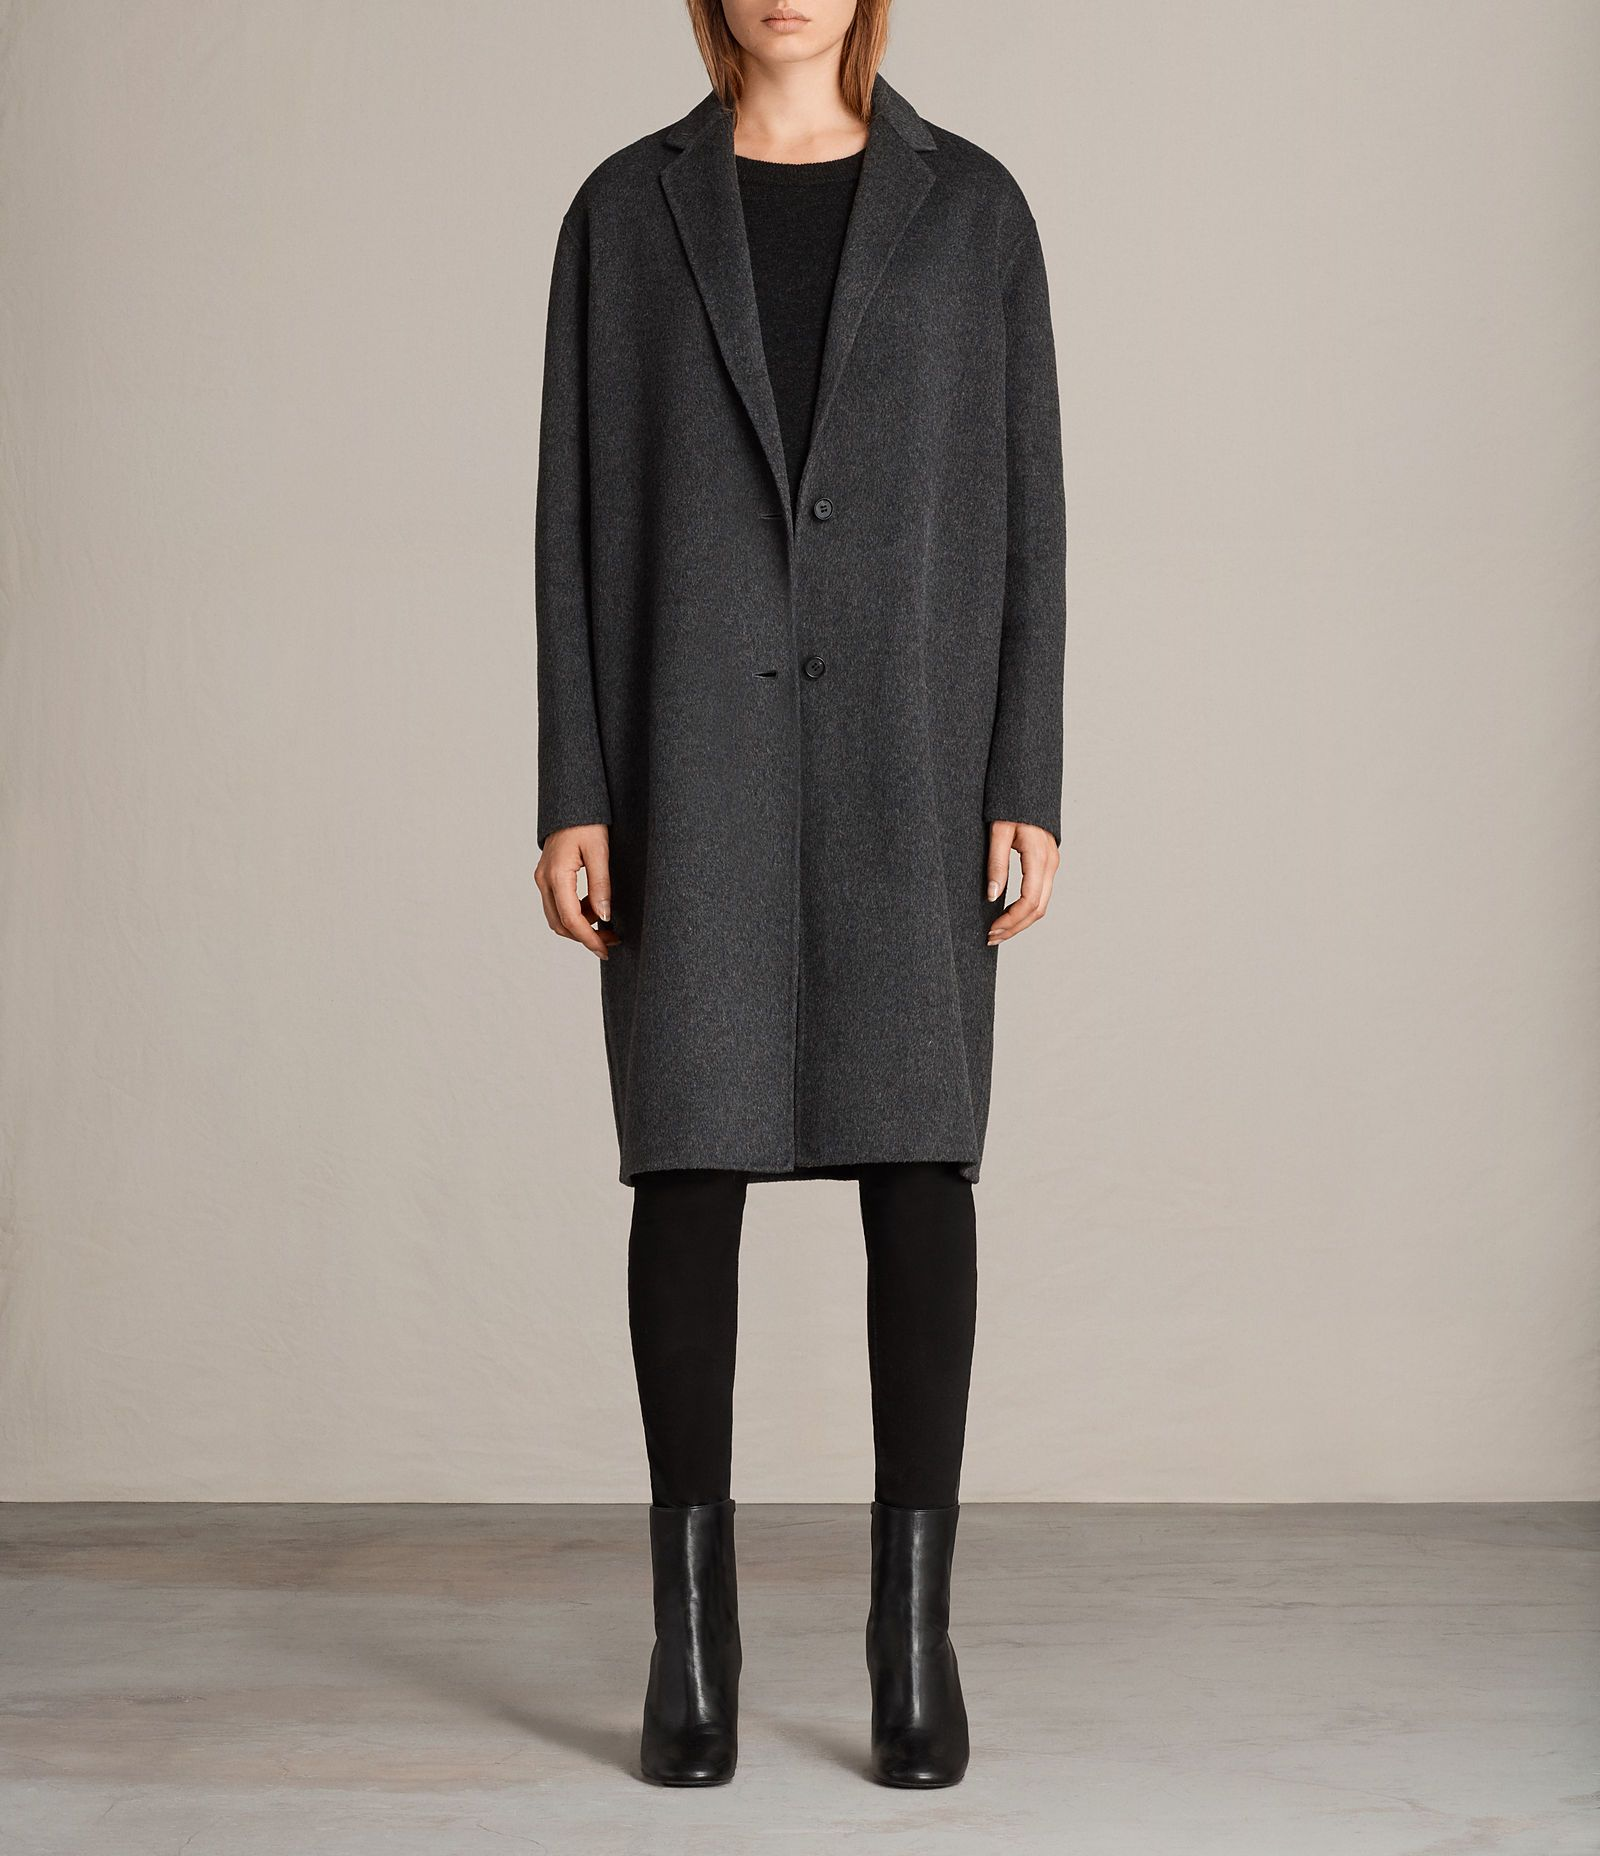 bce9eecd6052 ALLSAINTS US  Womens Anya Coat (Charcoal Grey)